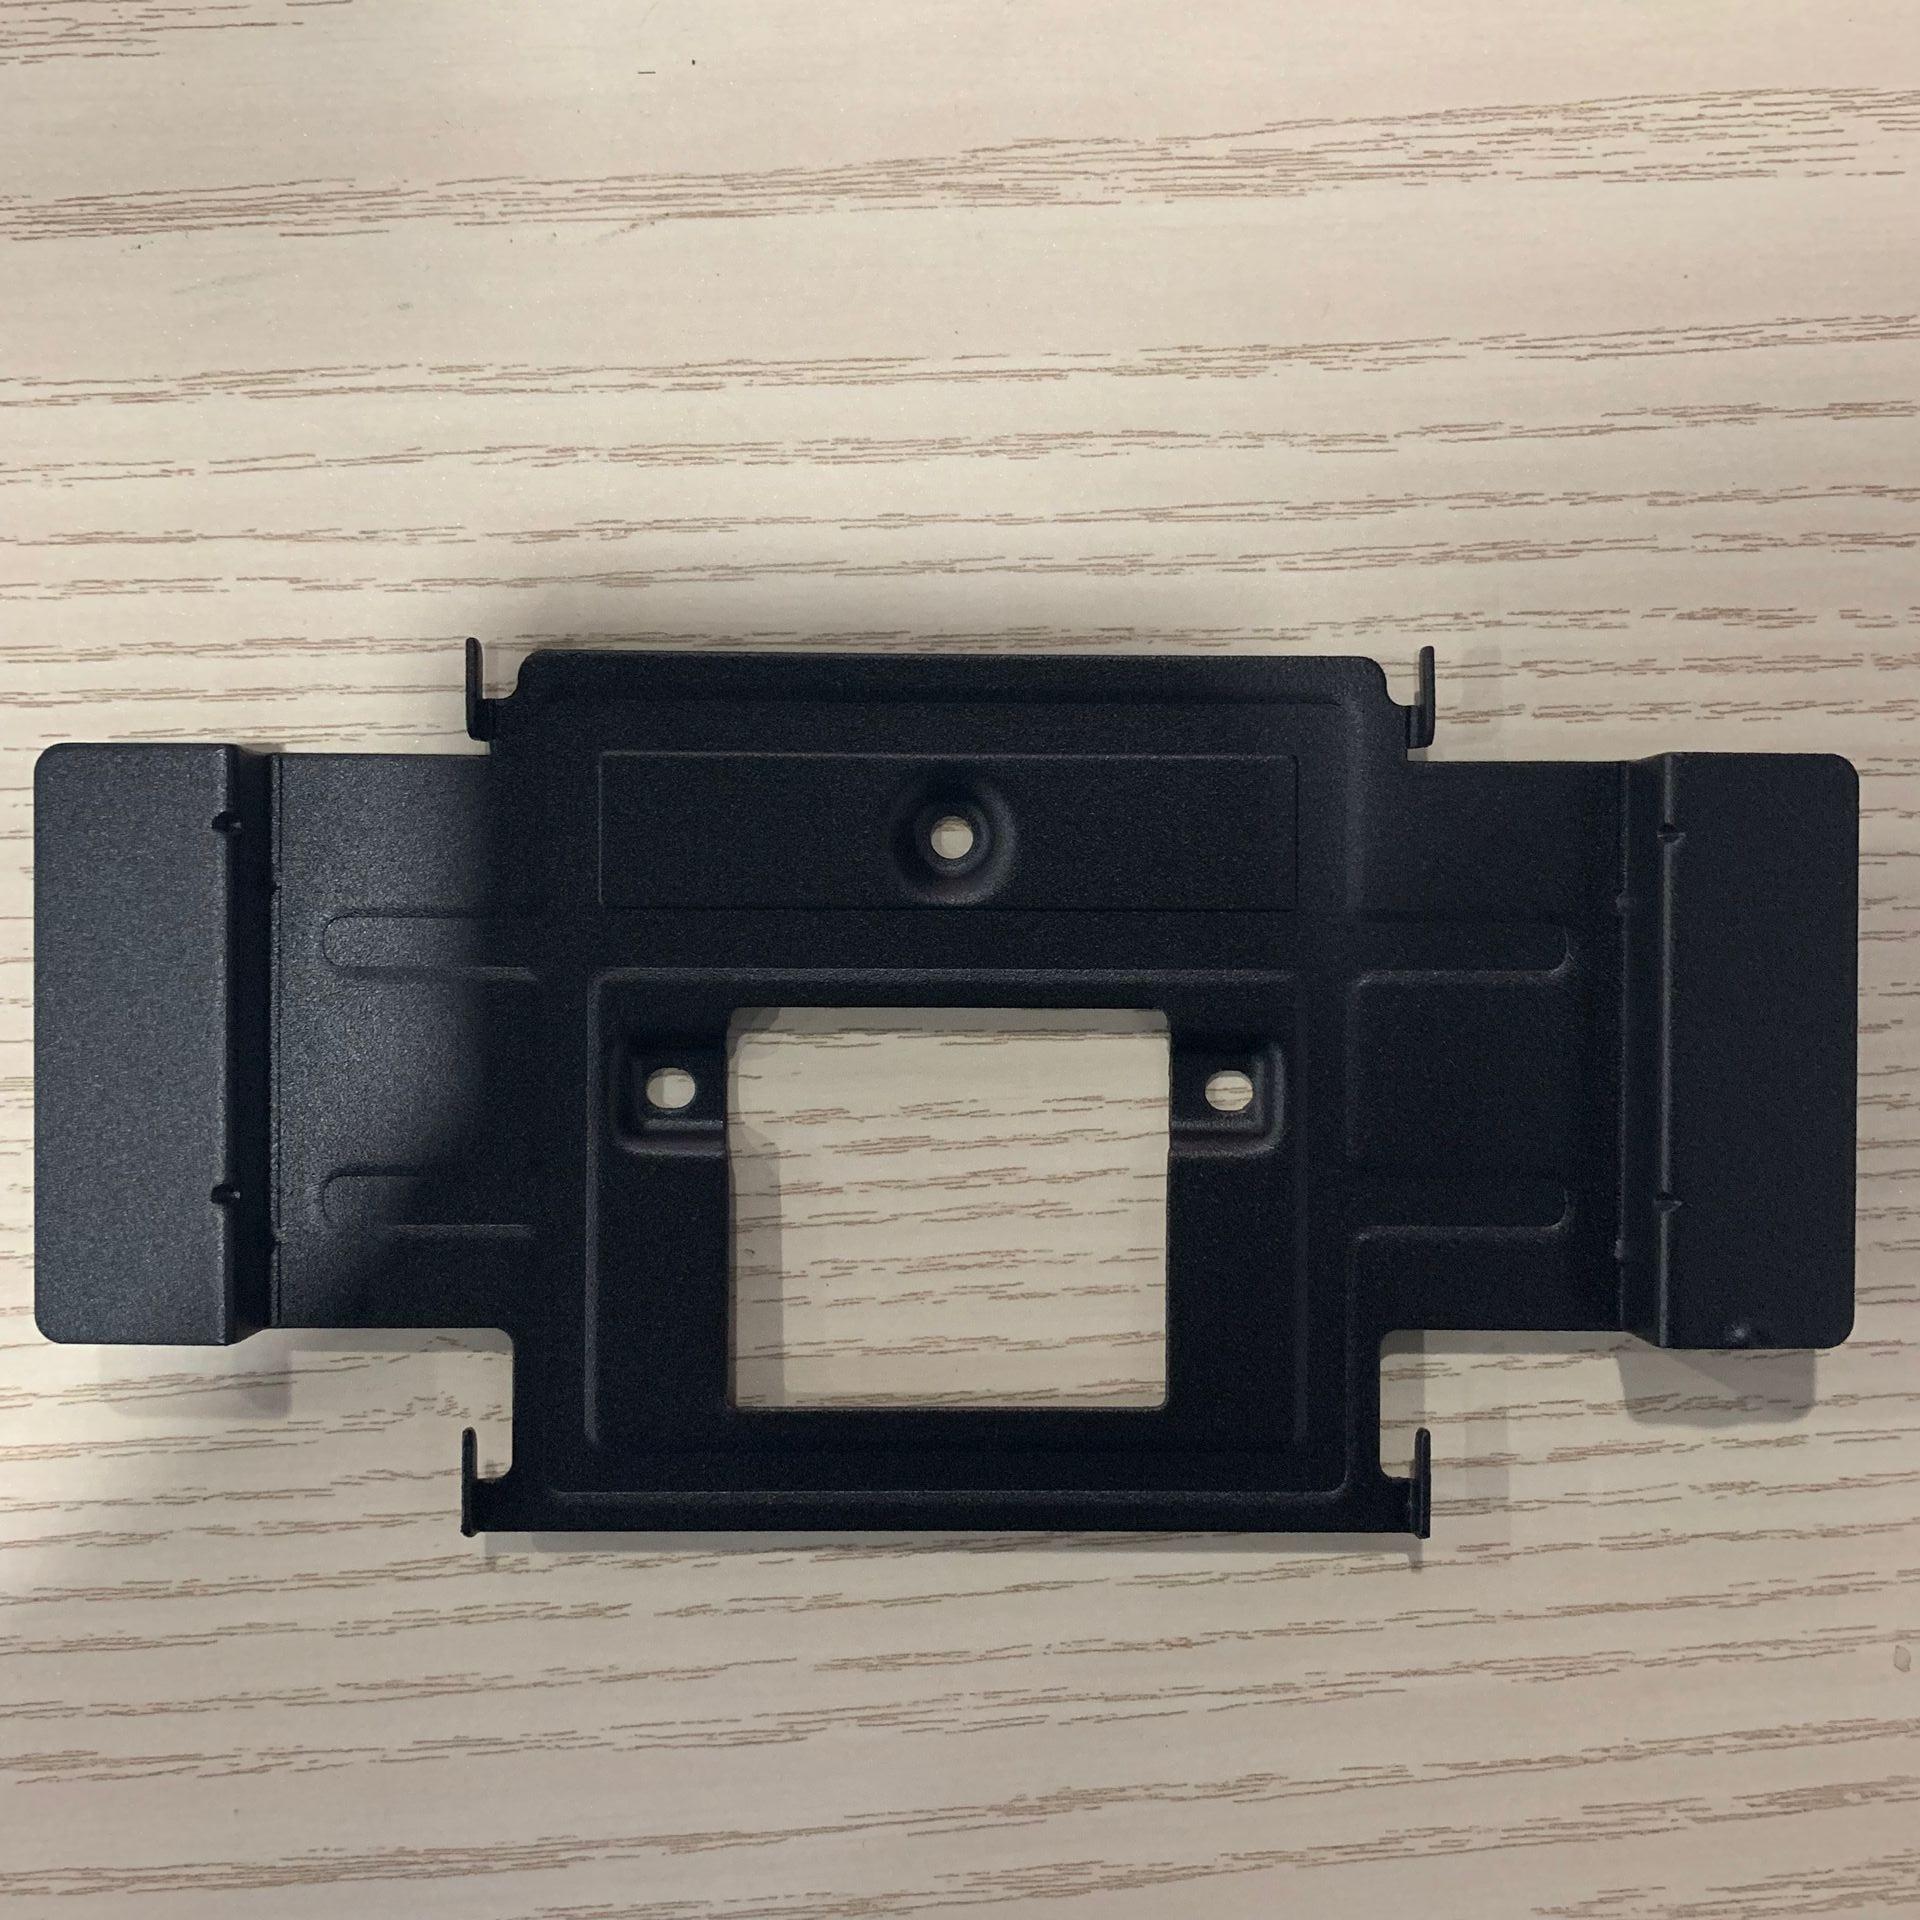 VTM123 Mounting Brackets For VTH1550CH